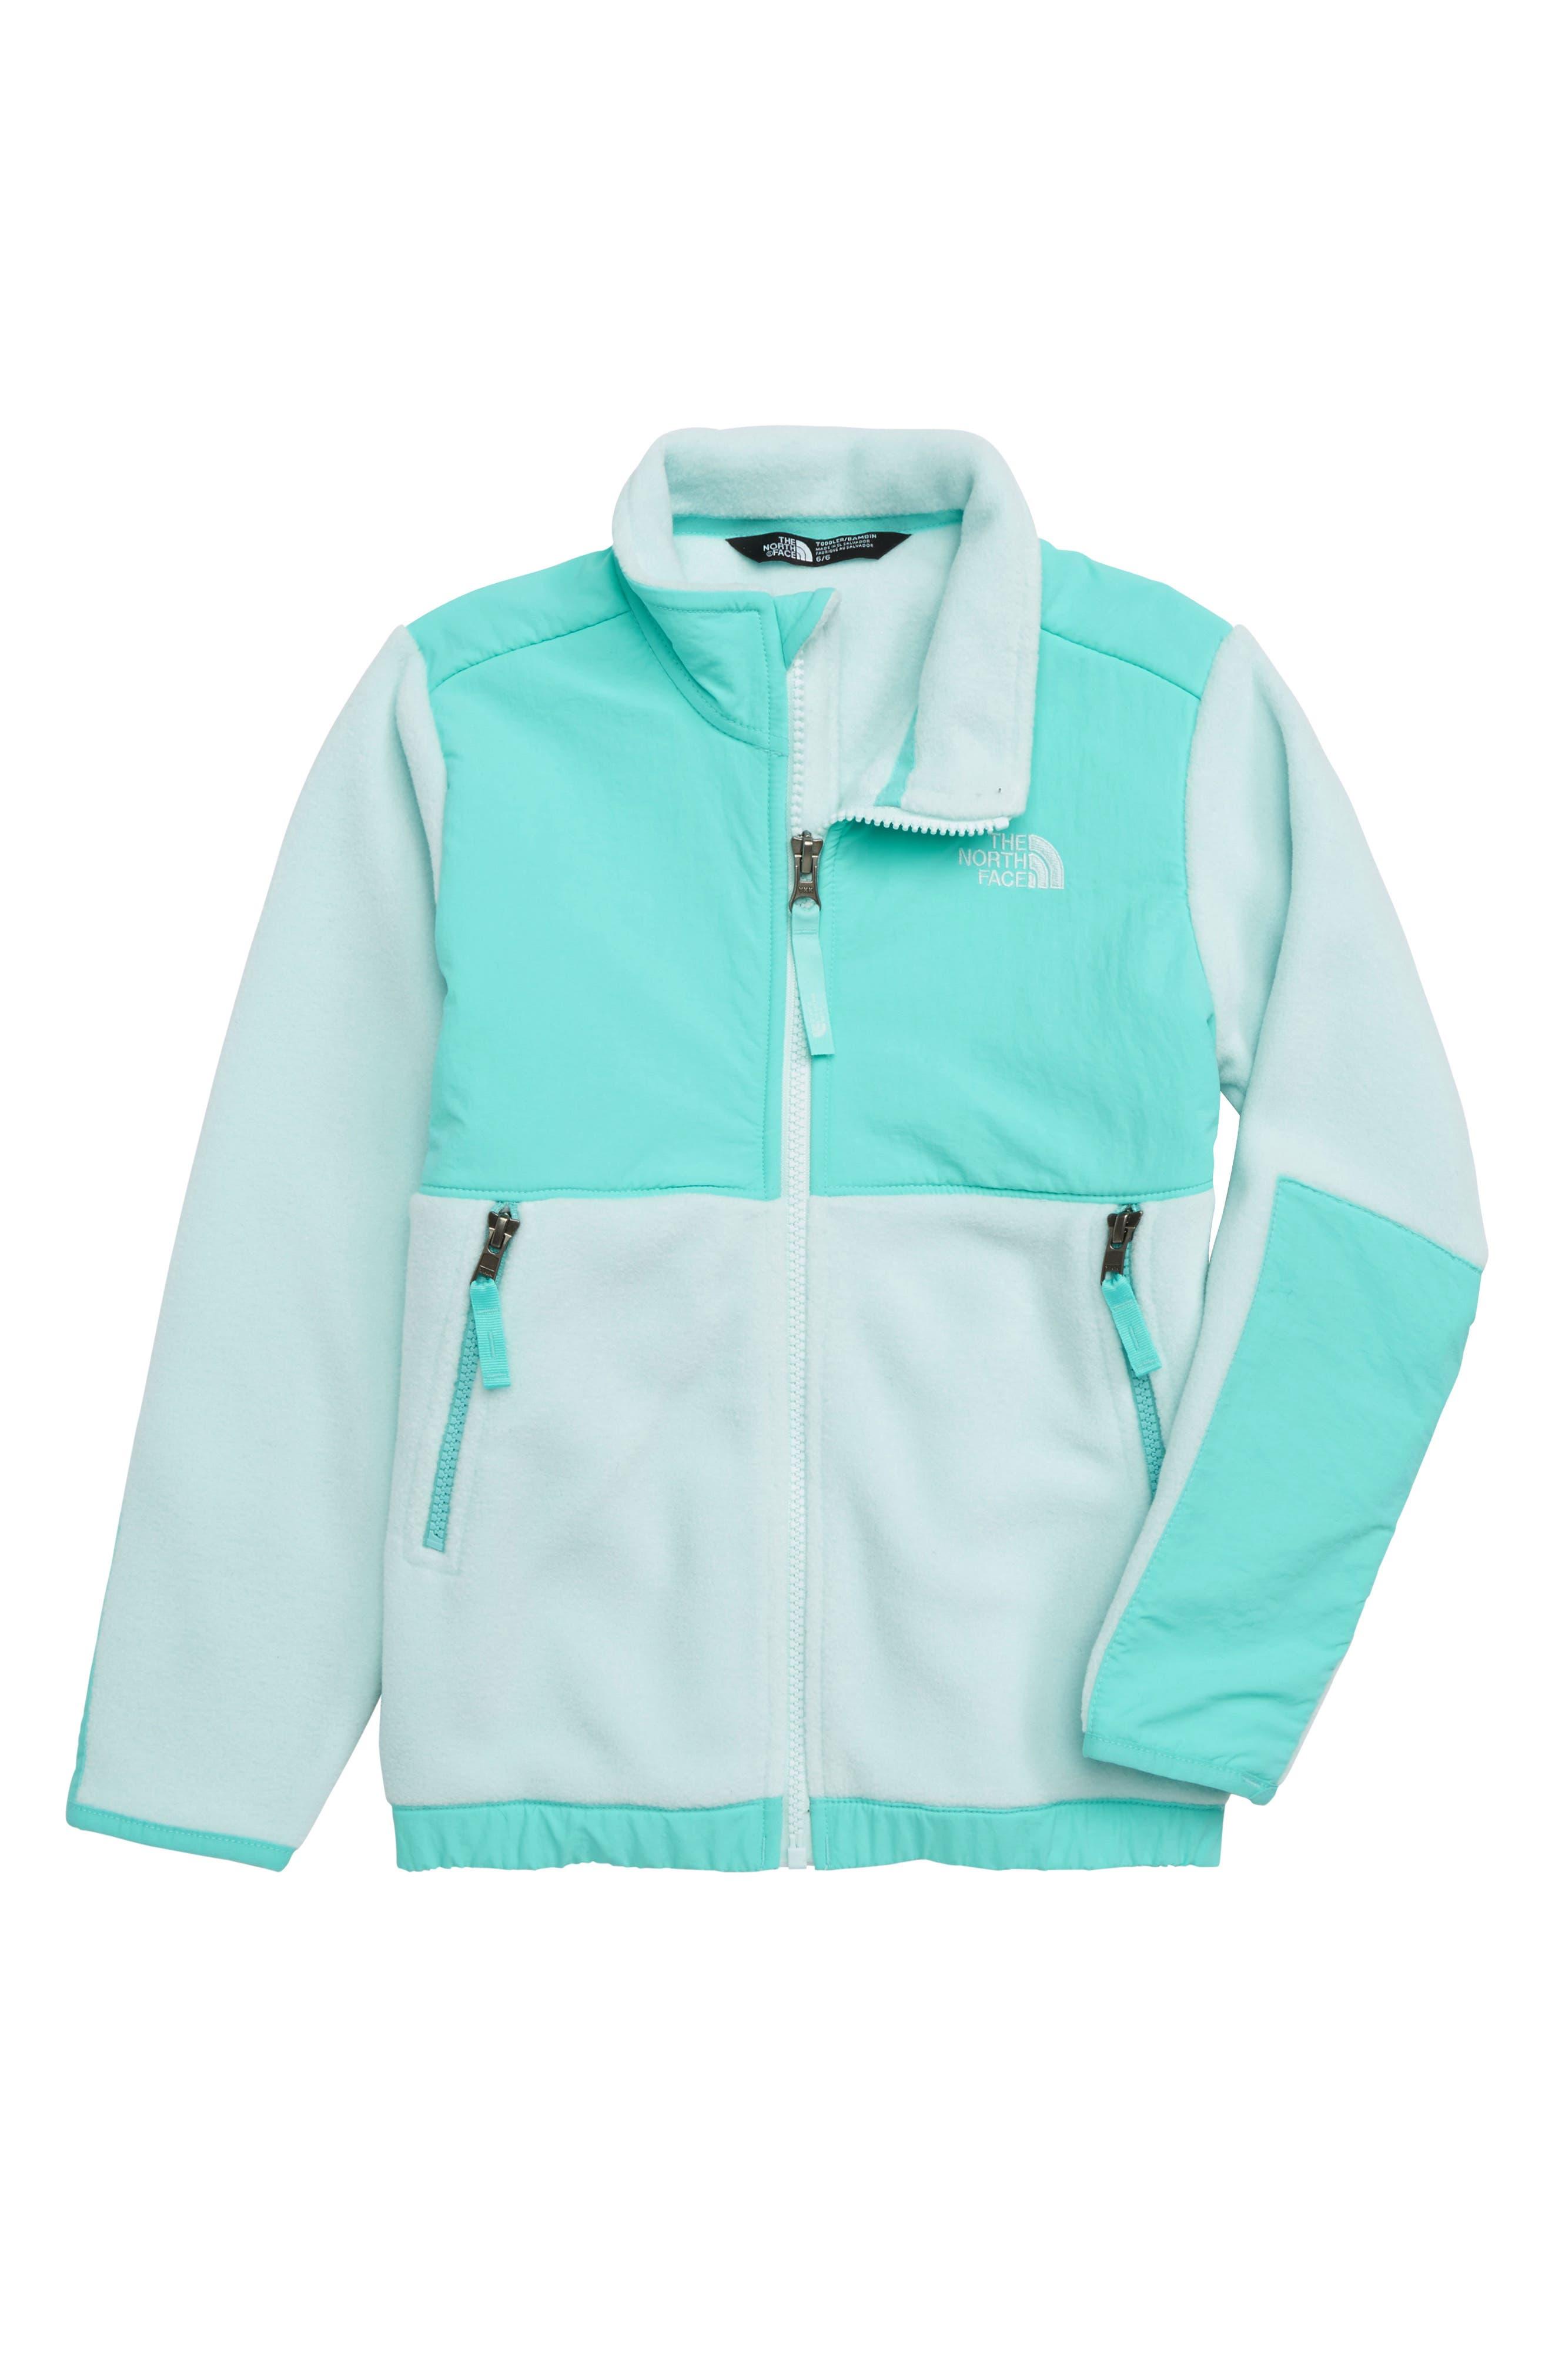 Denali Recycled Fleece Jacket,                             Main thumbnail 1, color,                             ORIGIN BLUE